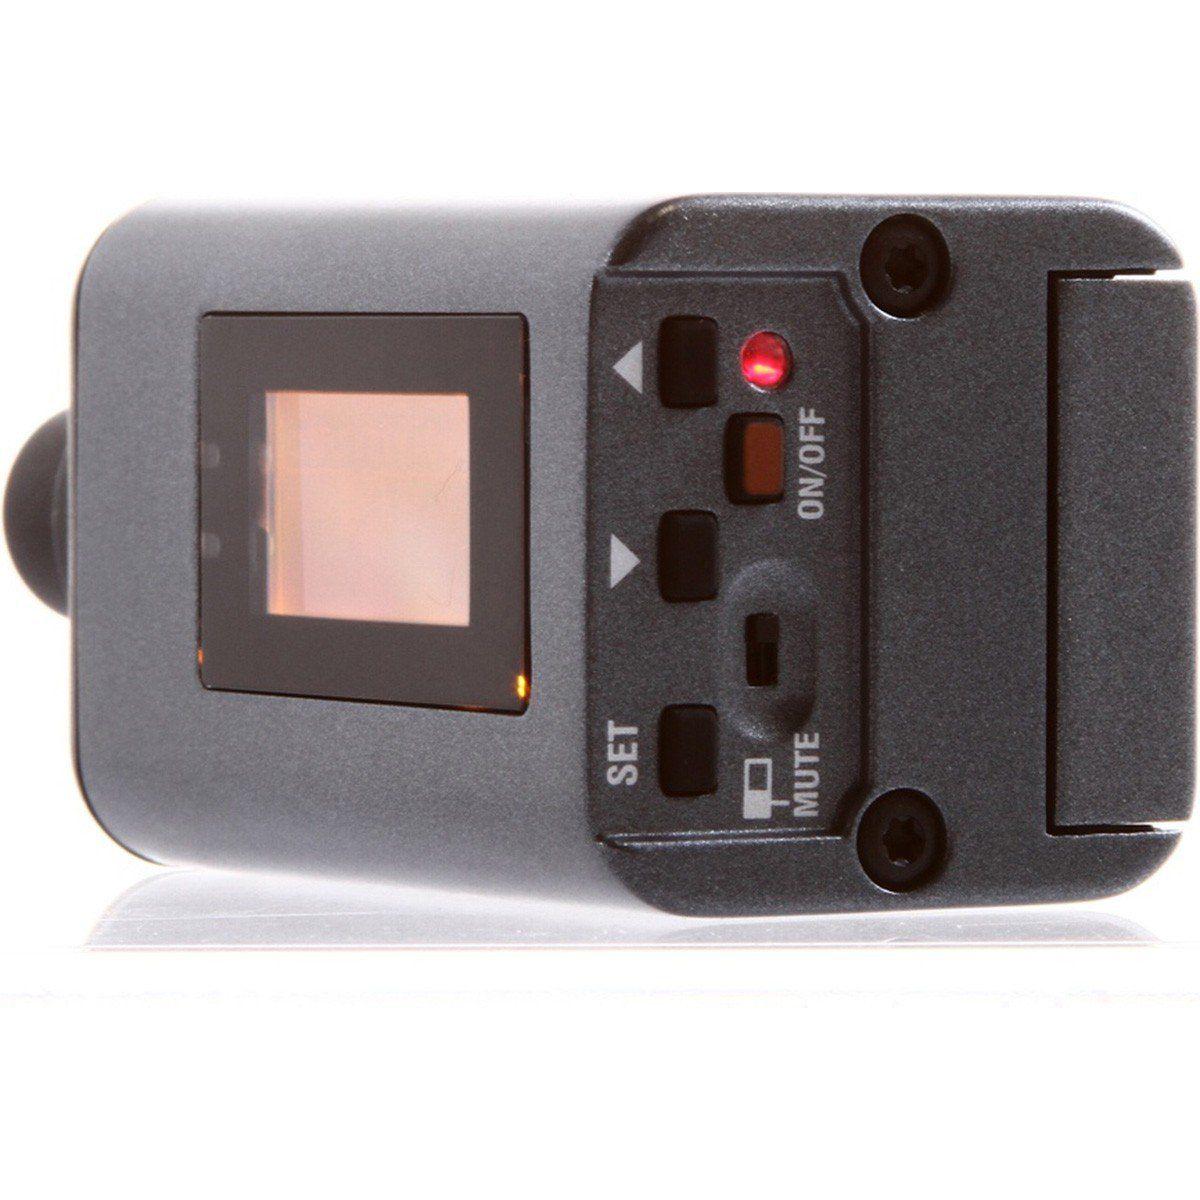 Sennheiser EW 100 ENG-G3 Microfone de lapela Sennheiser EW100 ENG-G3 para Câmeras